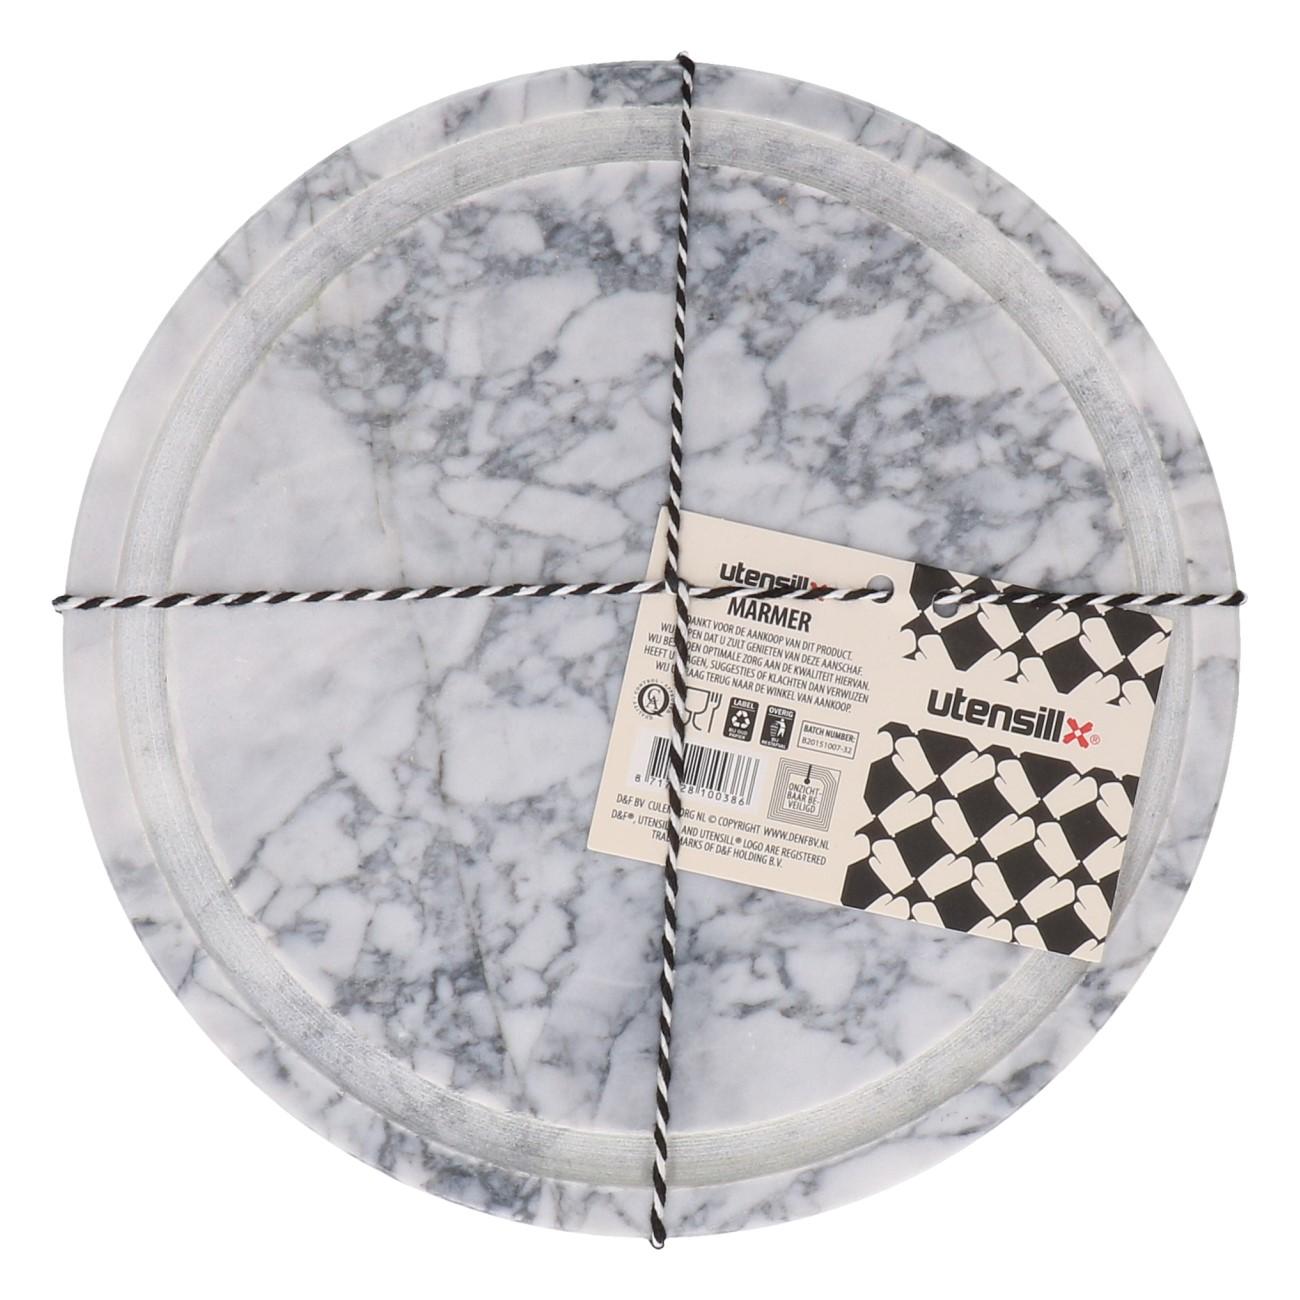 Onderzetter marmer rond wit 20cm